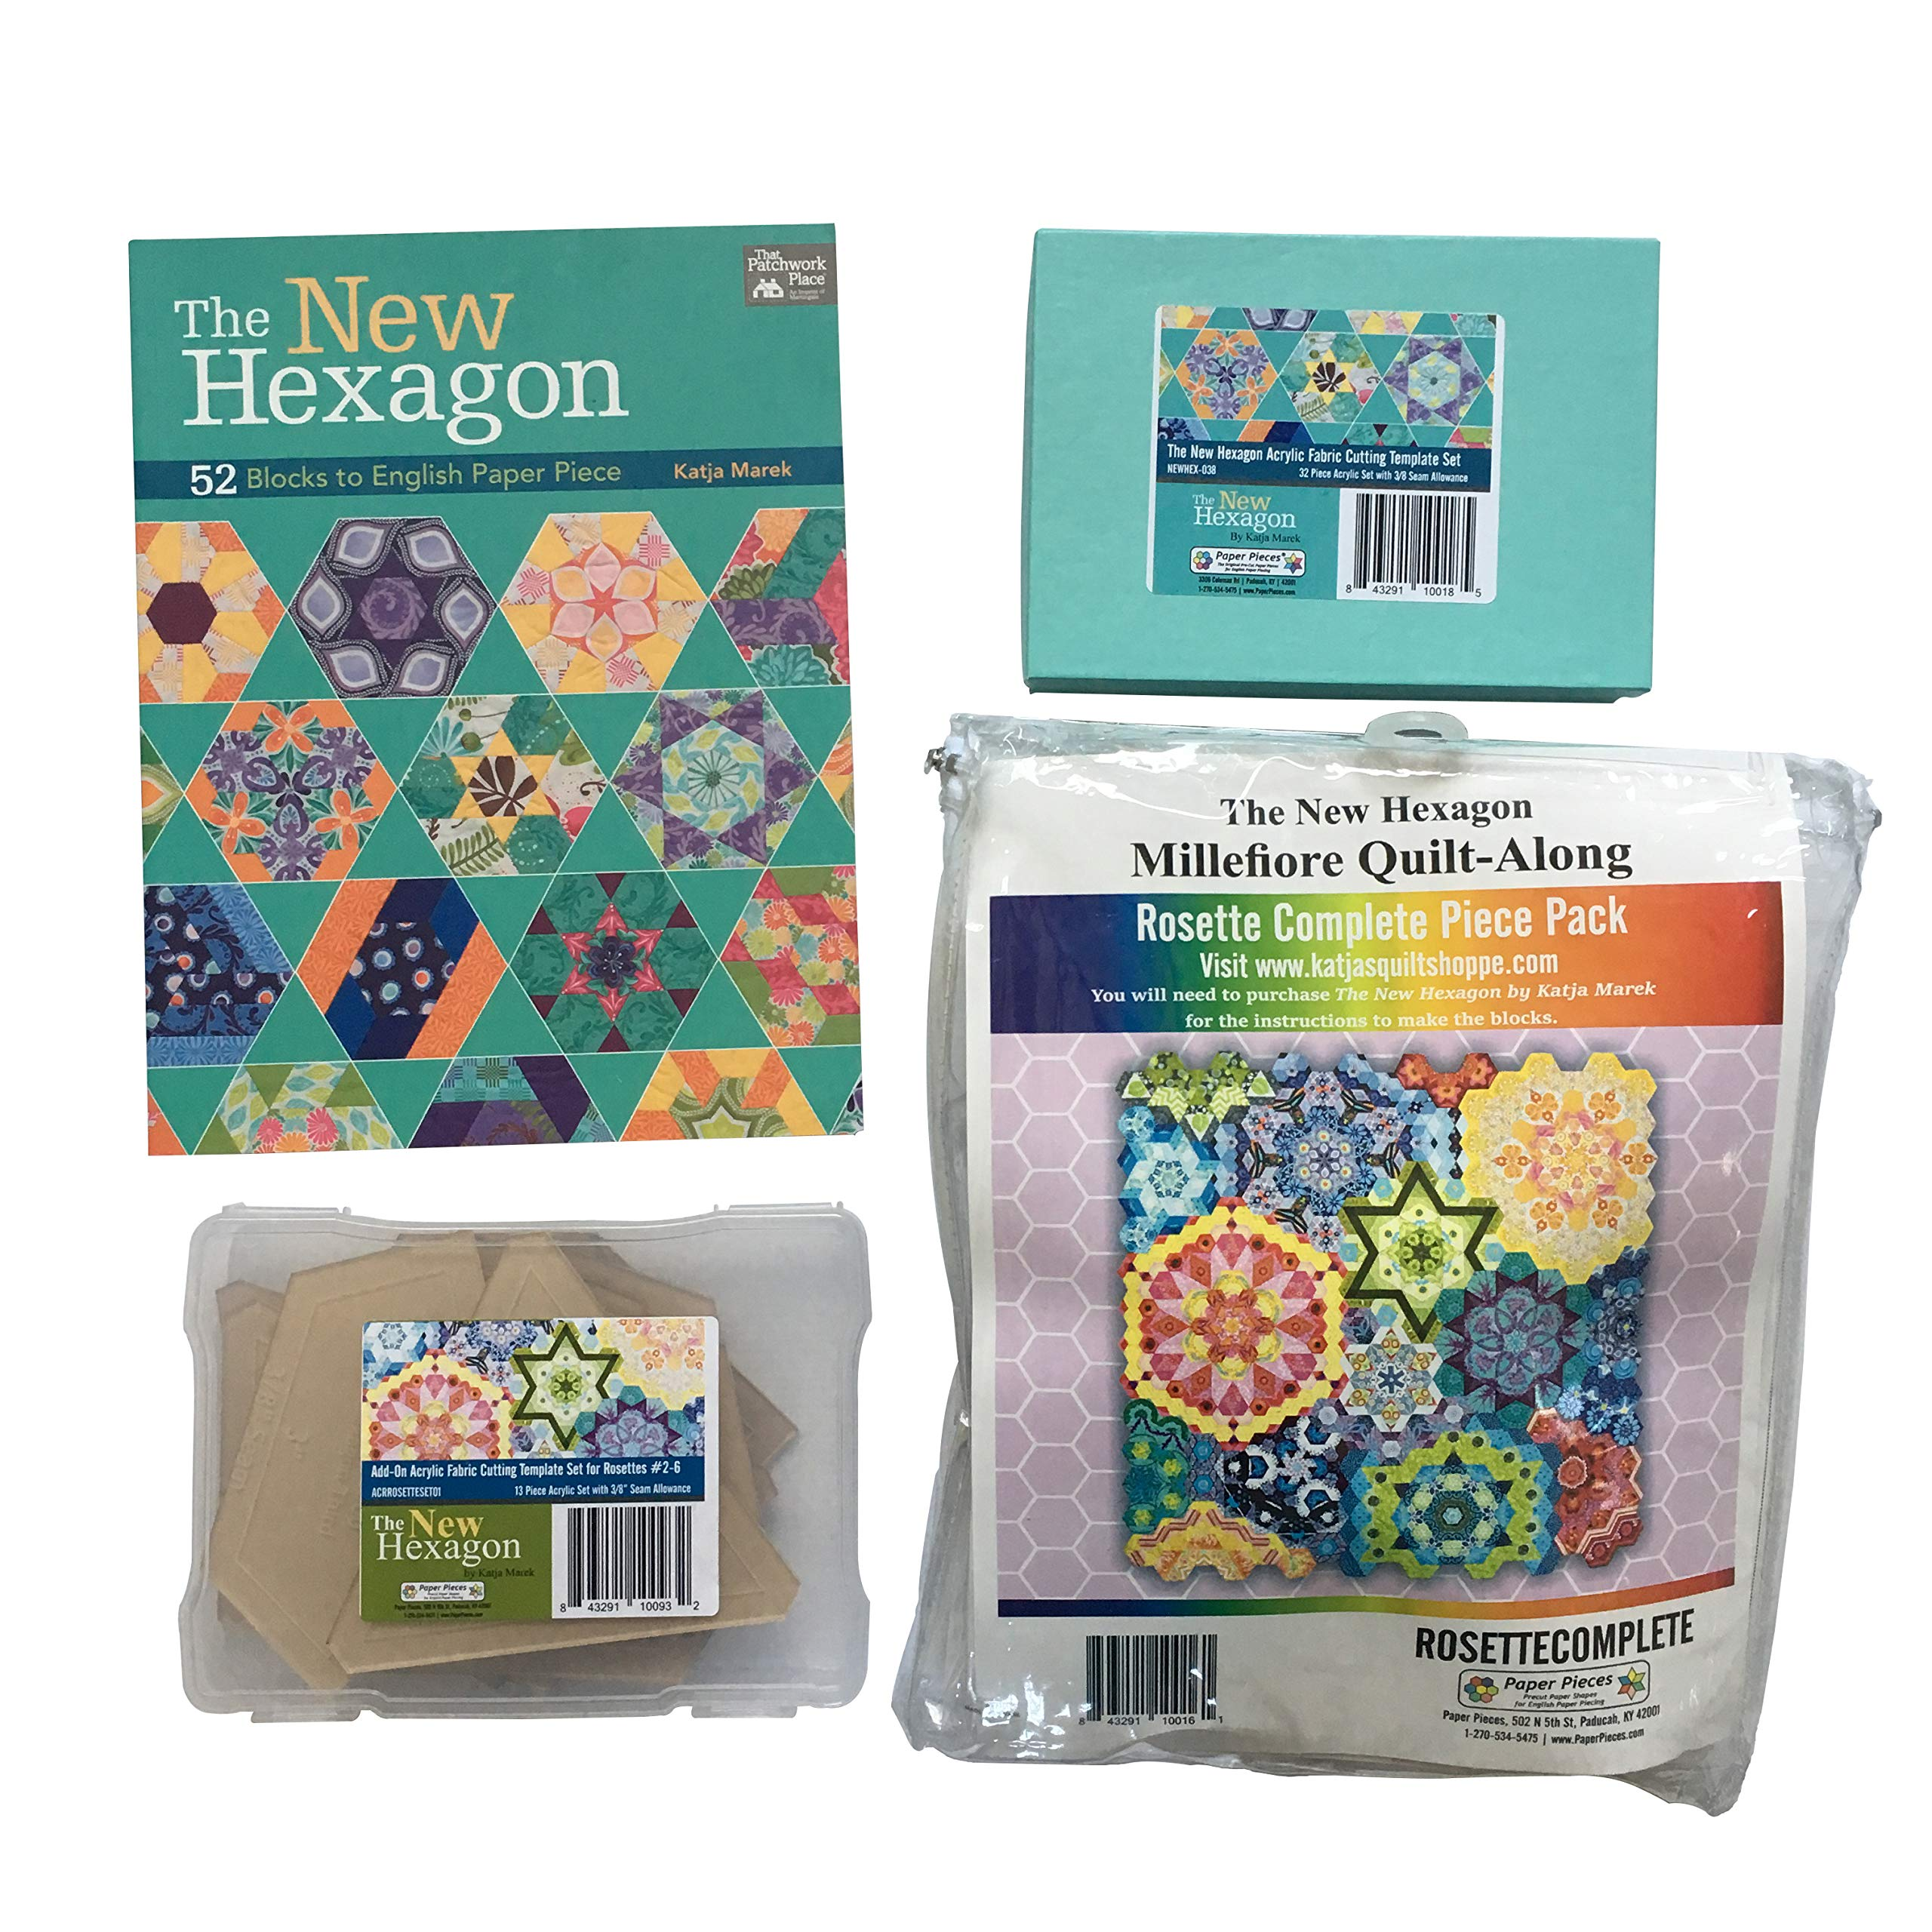 The New Hexagon Quilt Kit by Katja Marek (Millefiore Quilt Along) by Katja Marek Quilt Patterns